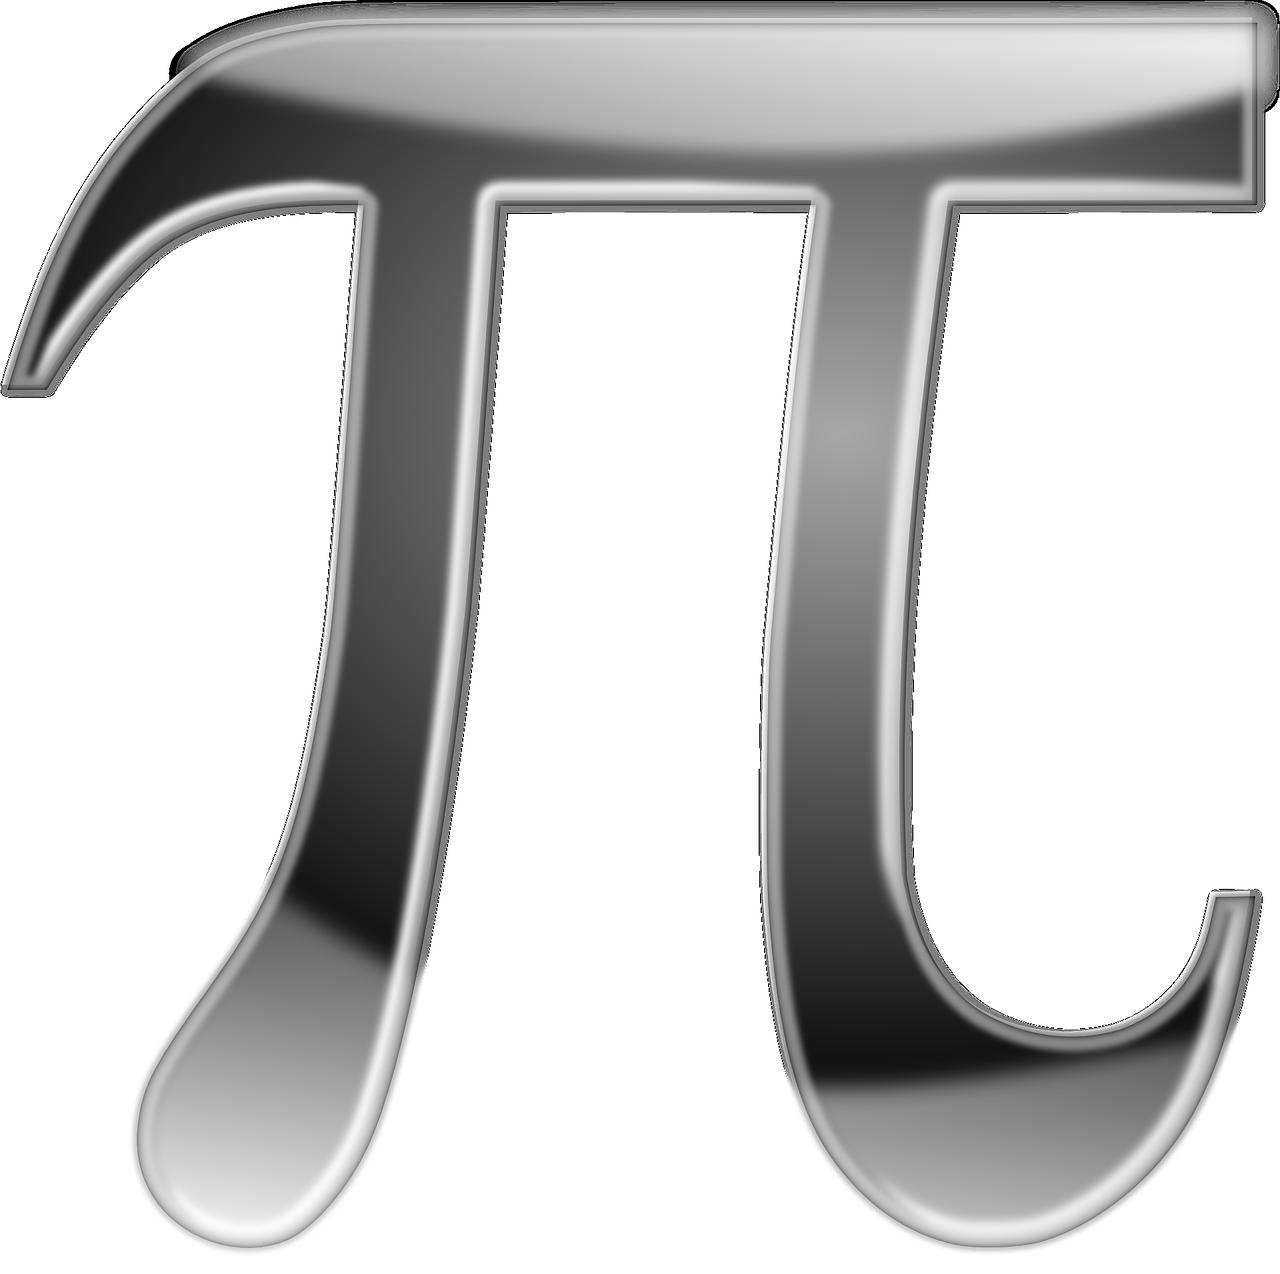 http://pixabay.com/de/pi-mathematik-konstant-gl%C3%A4nzend-151602/